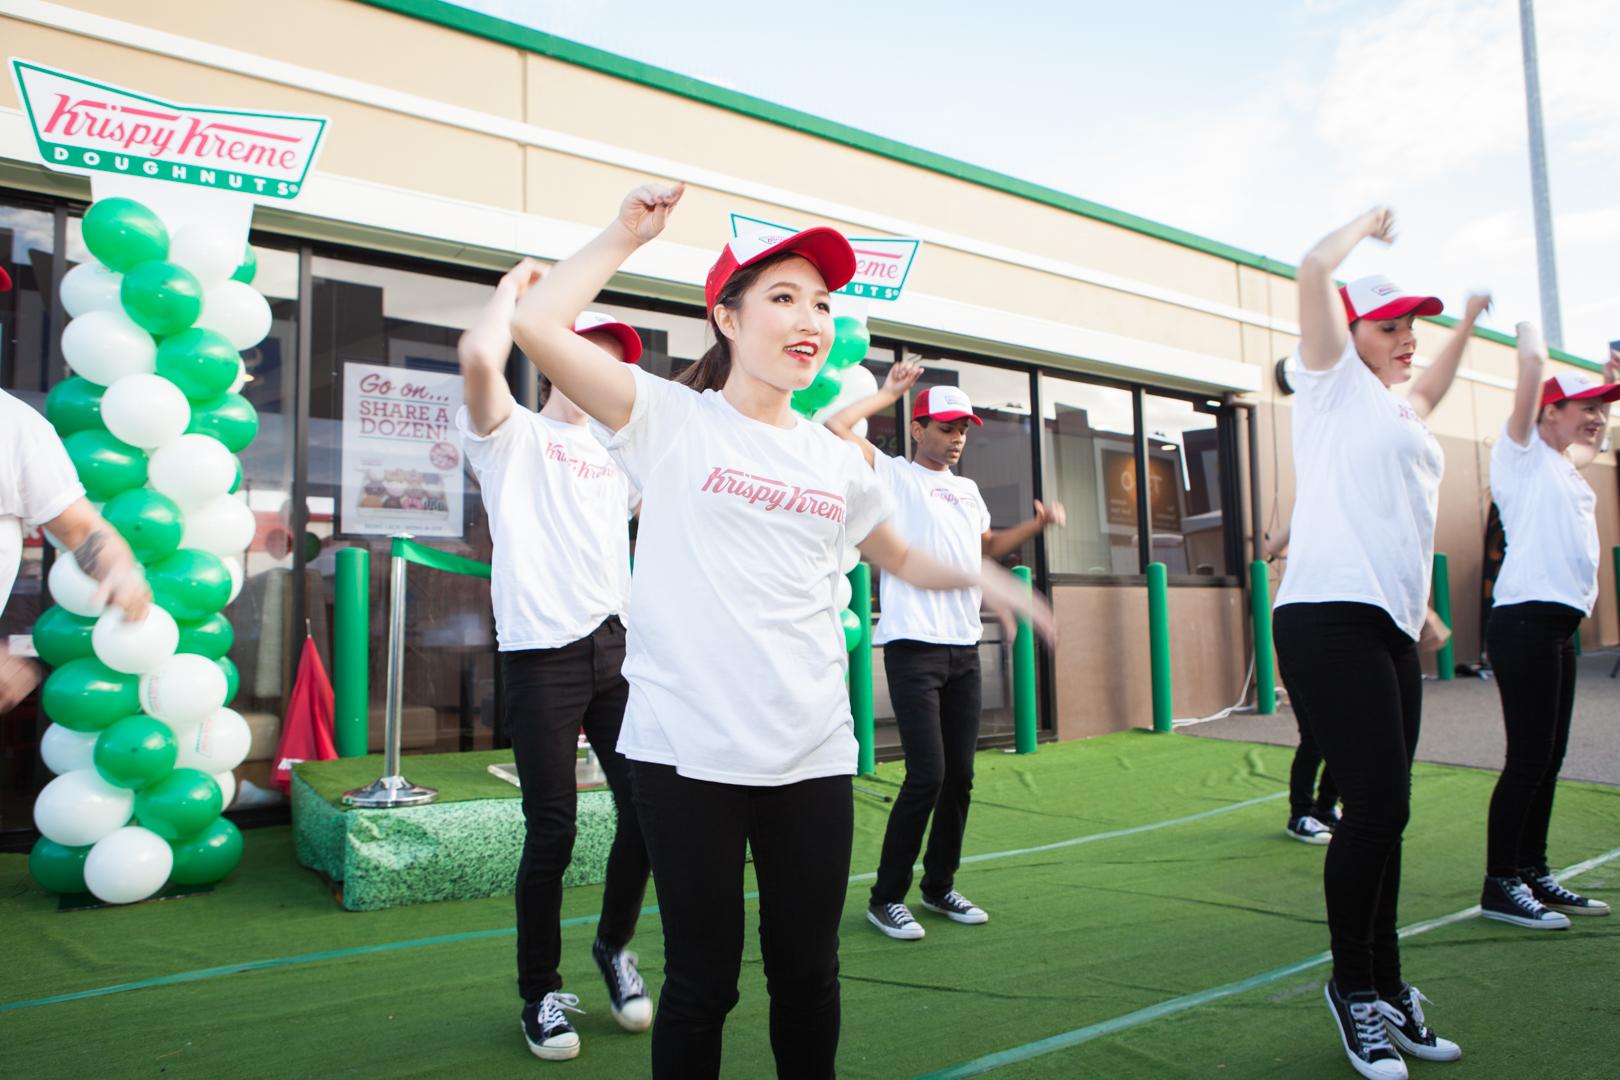 Krispy Kreme  Krispy Kreme - Store Openings   Click here for gallery